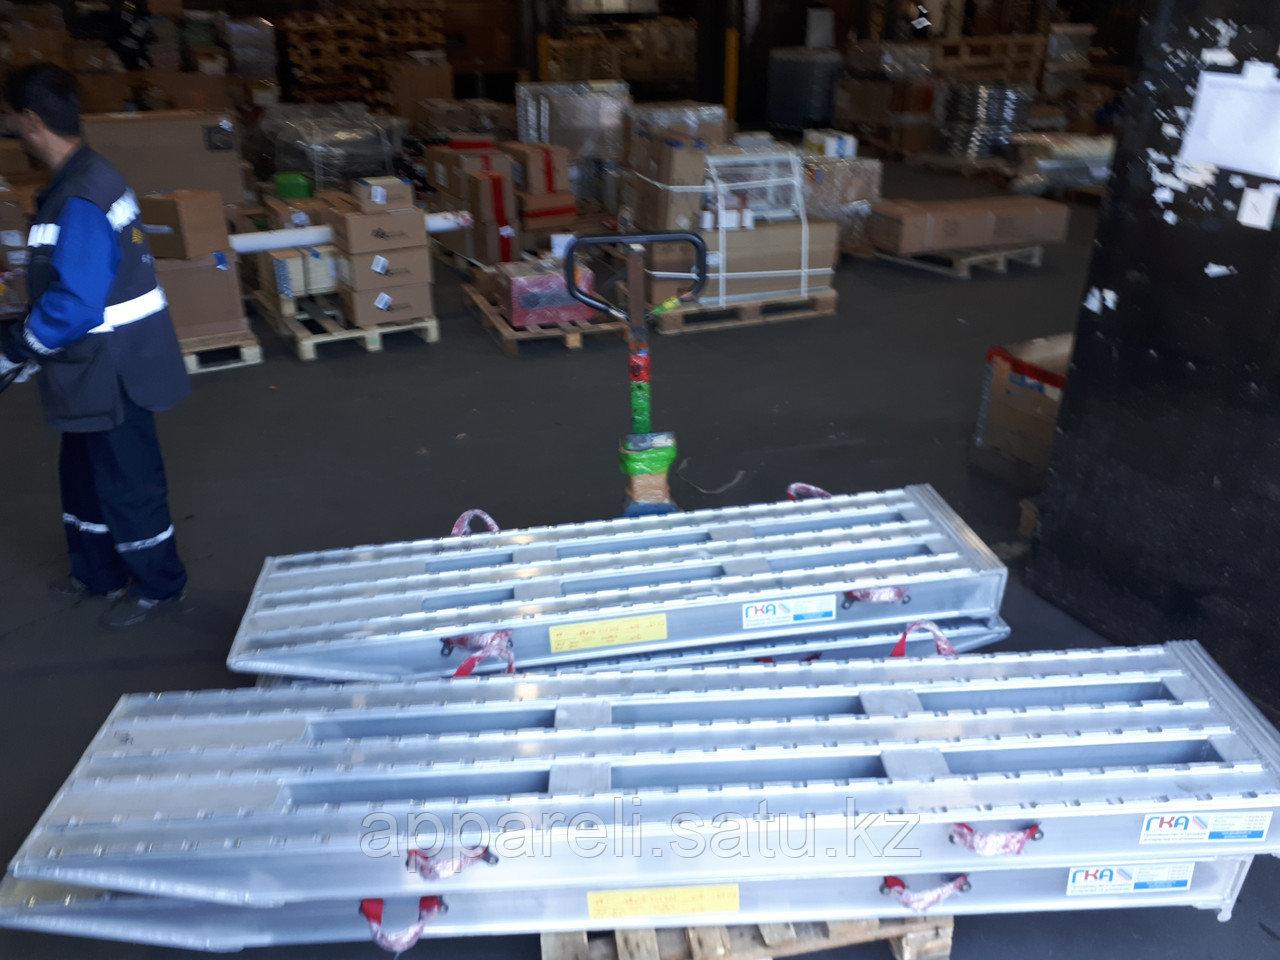 Алюминиевые аппарели от производителя 1,9 метра, 32-45 тонн